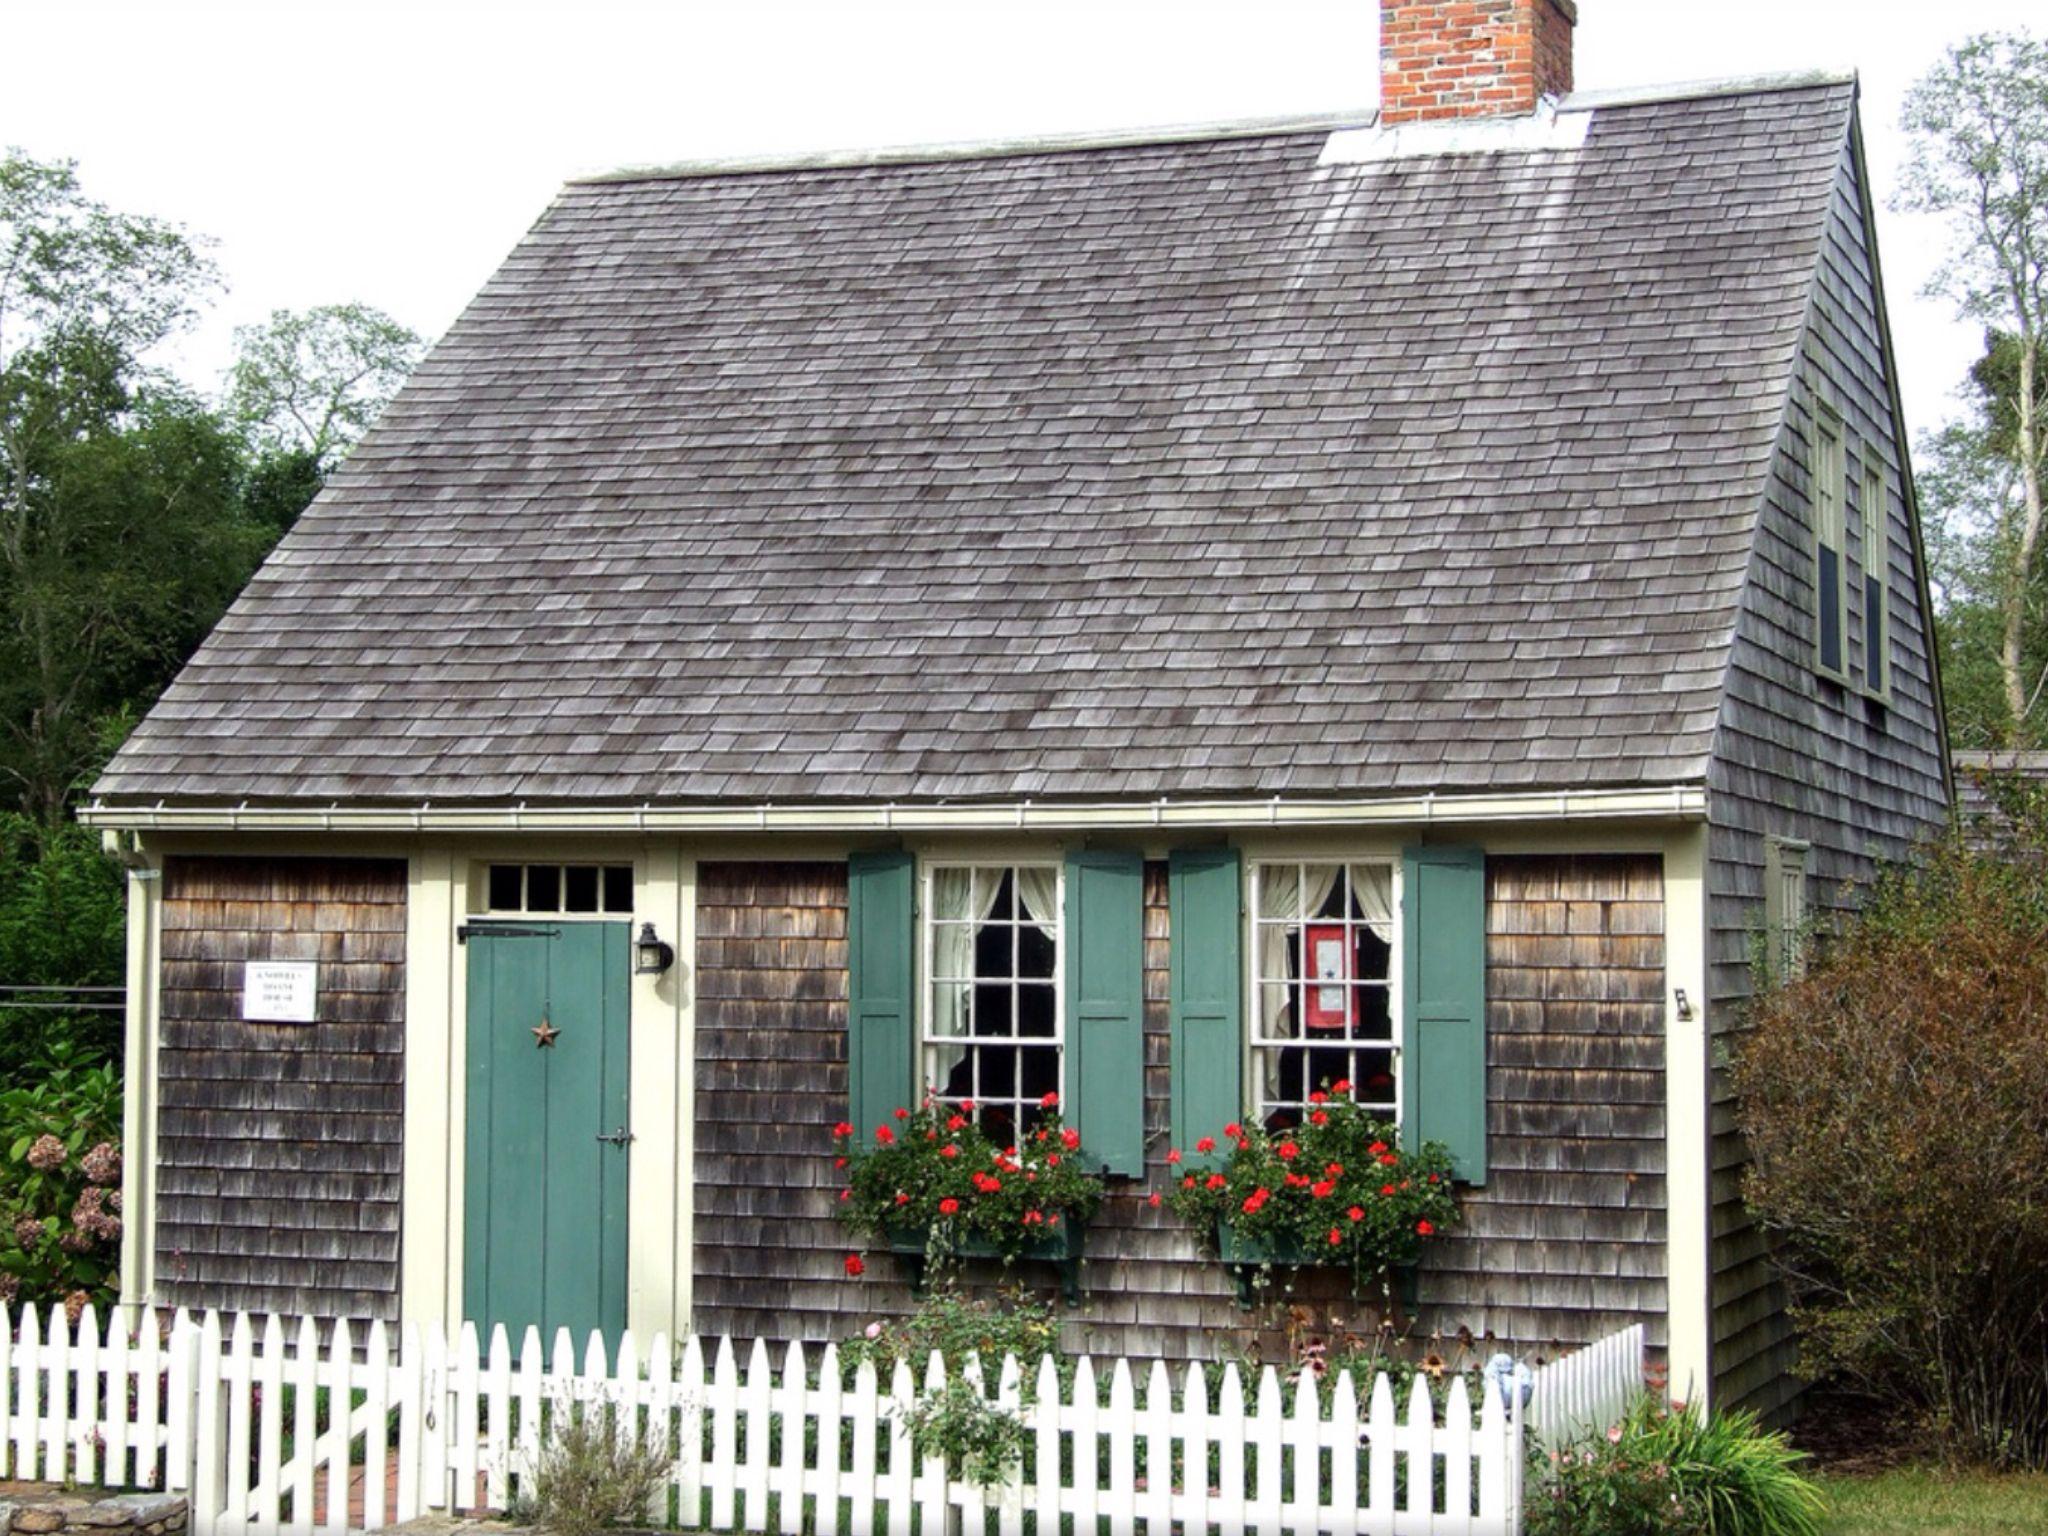 Nantucket cottage ⛵ ⛵ Nantucket Pinterest